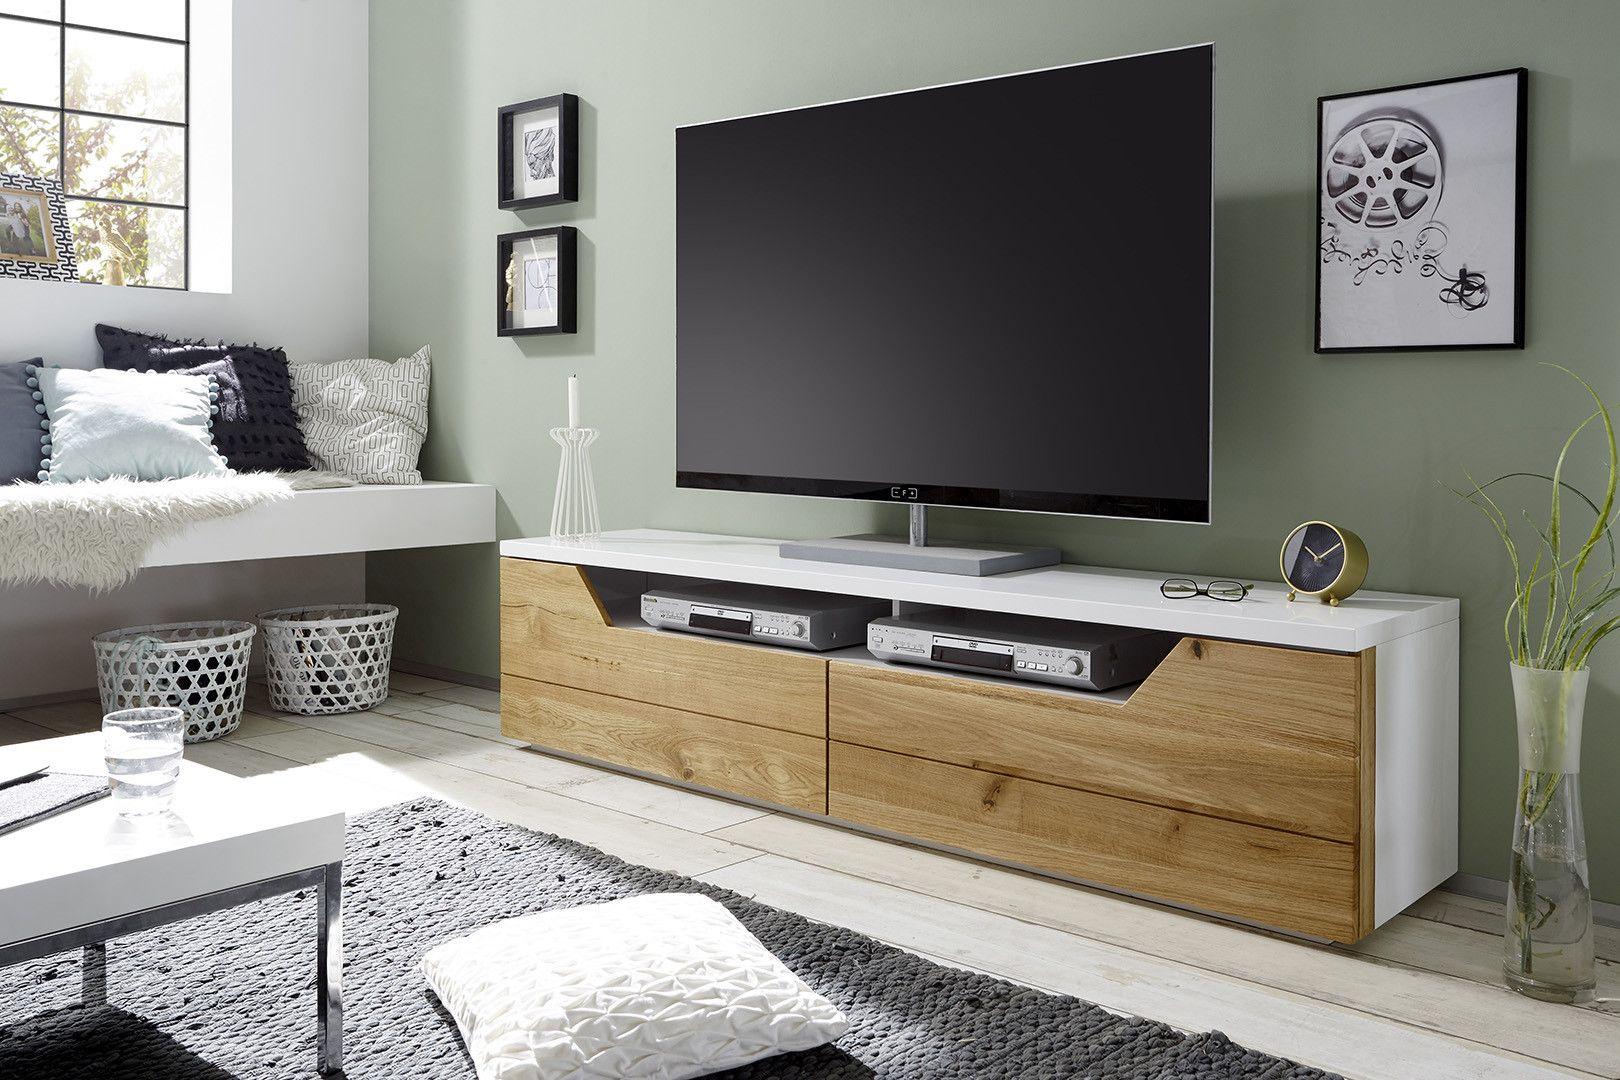 Meuble Tv Scandinave Blanc Chene Fabiola Matelpro En 2020 Meuble Tv Meuble Design Deco Meuble Tv